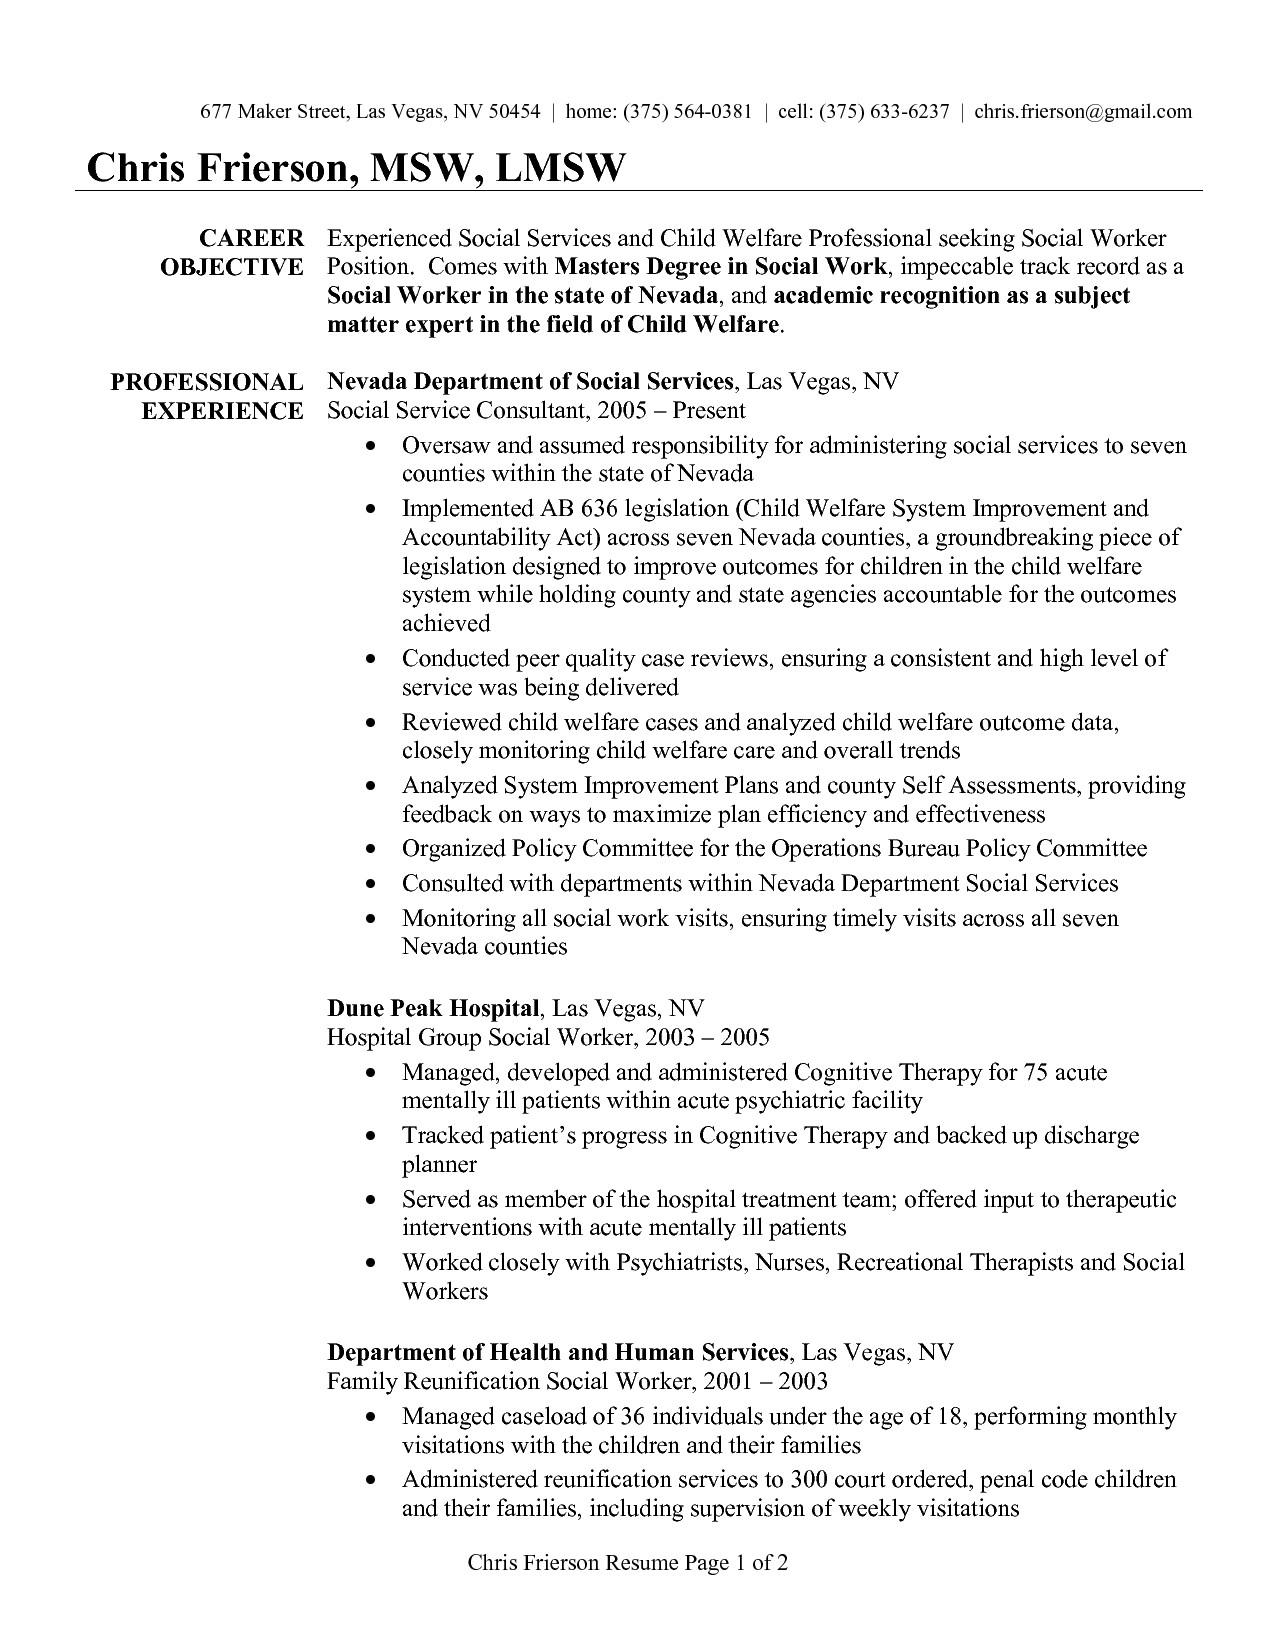 Social Work Resume Template social Work Resume Examples